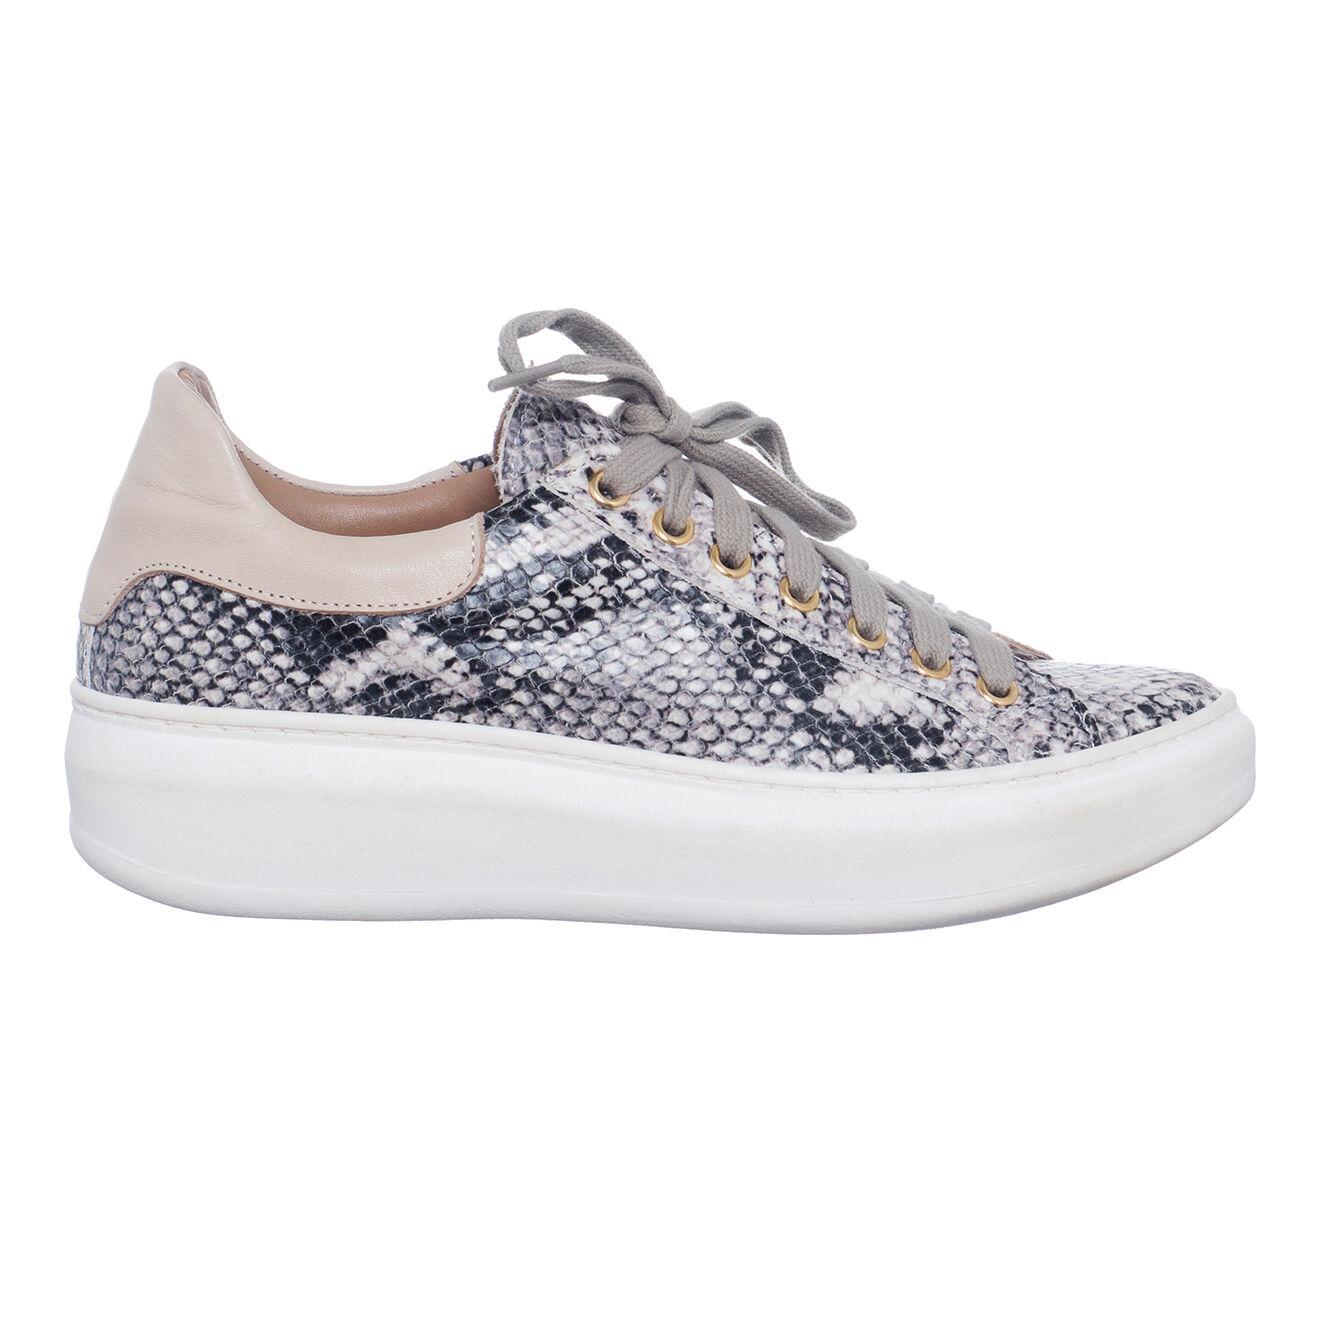 Sneakers en Cuir Alex python gris/noir - Loretta Pettinari - Modalova